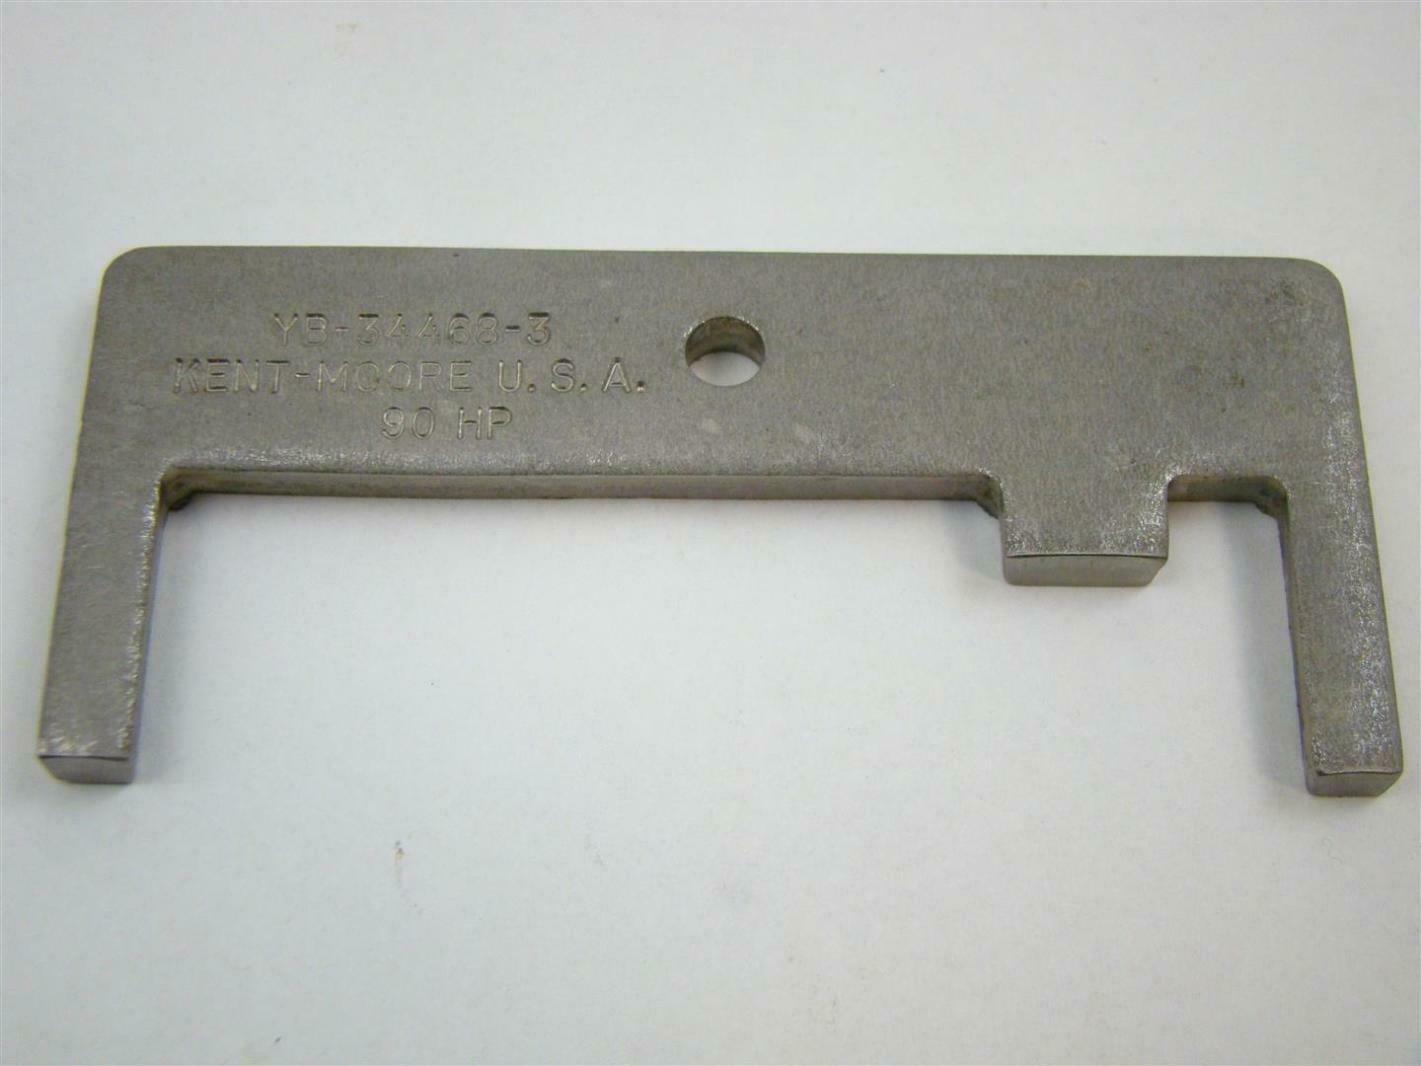 Kent-Moore Reverse Gear Shim Gauge Marine Tool ,90 HP, YB-34468-3 | eBay